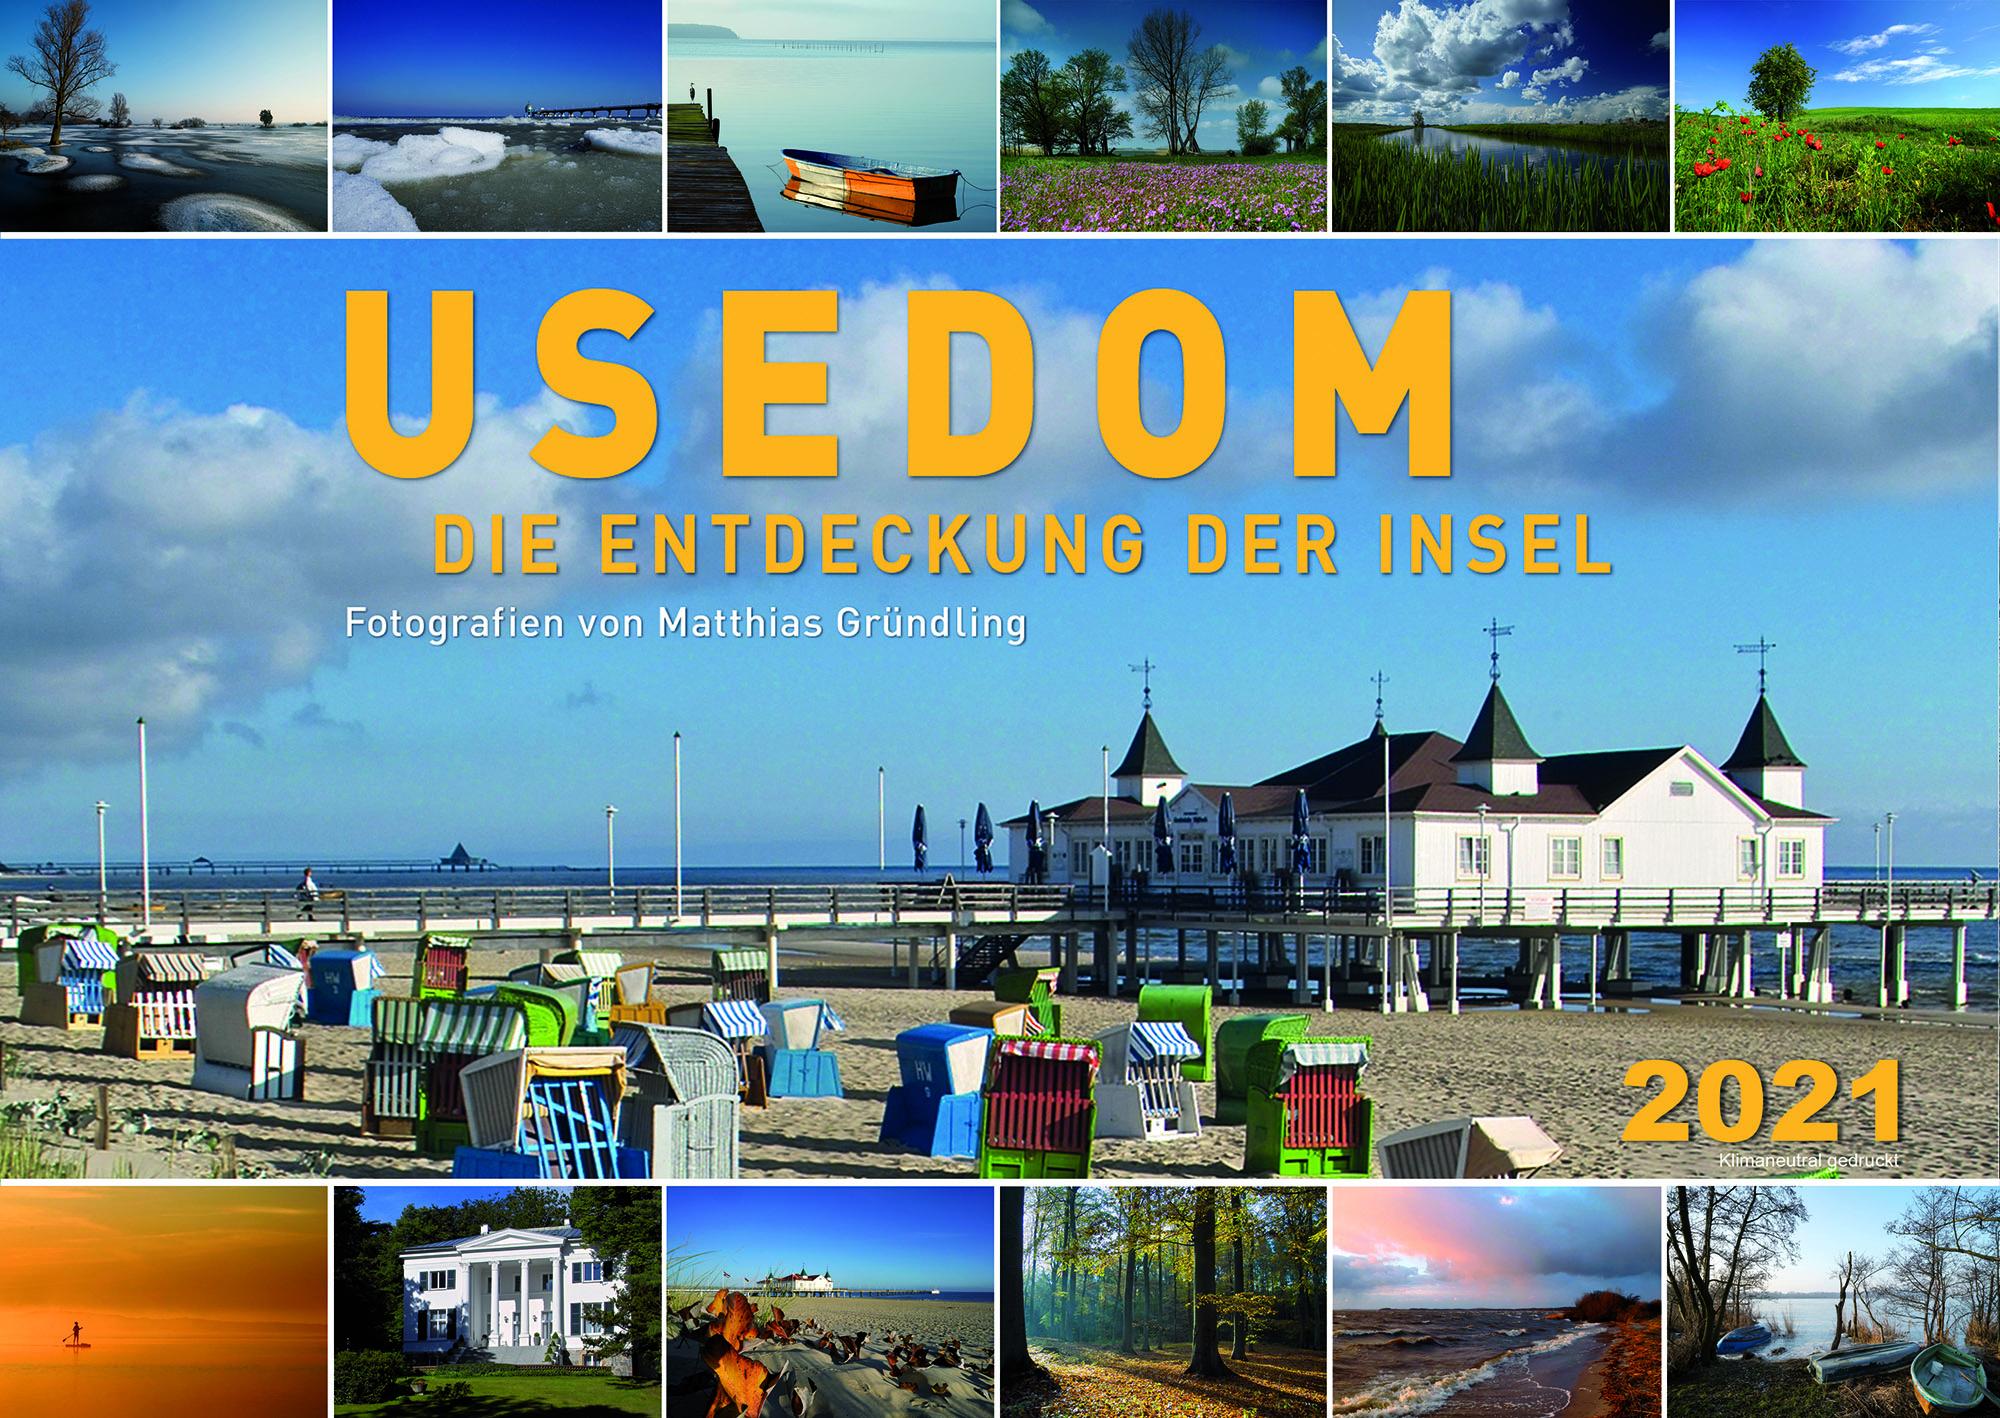 Kalender 2021 Usedom die Entdeckung der Insel